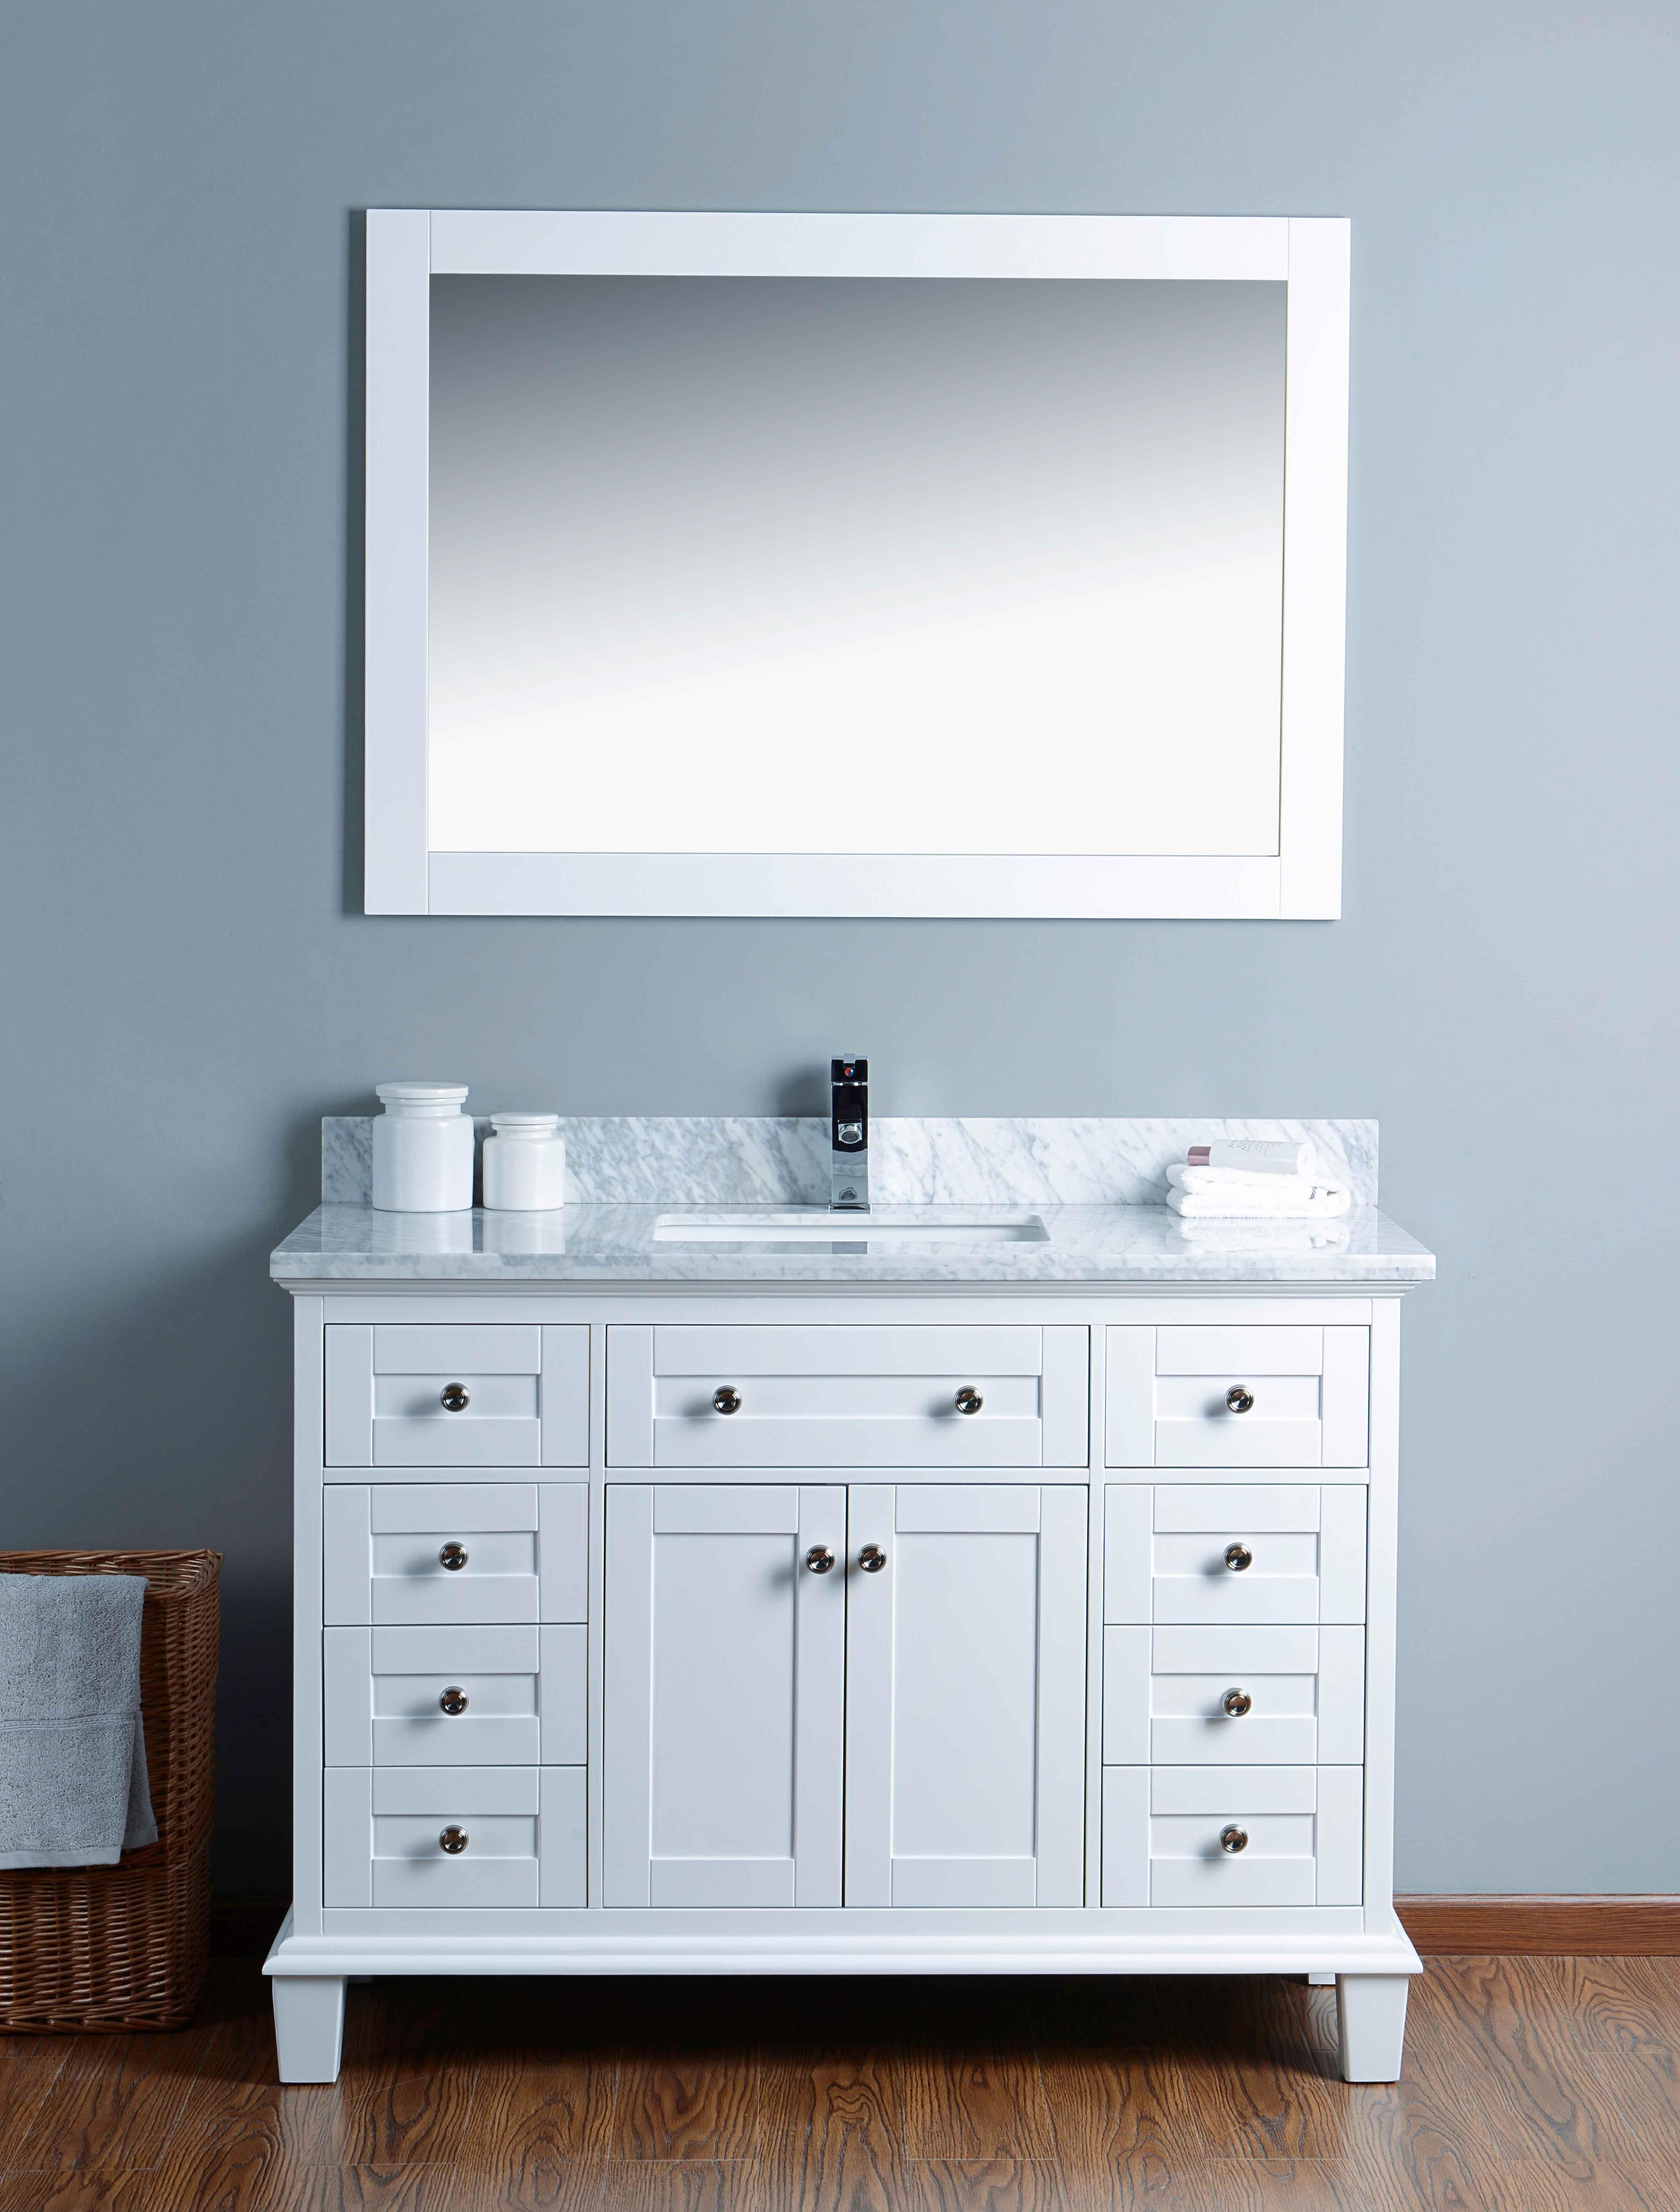 Home Design Express Mickdel Kira City 48 Inch White Vanity Set Homedesignexpress